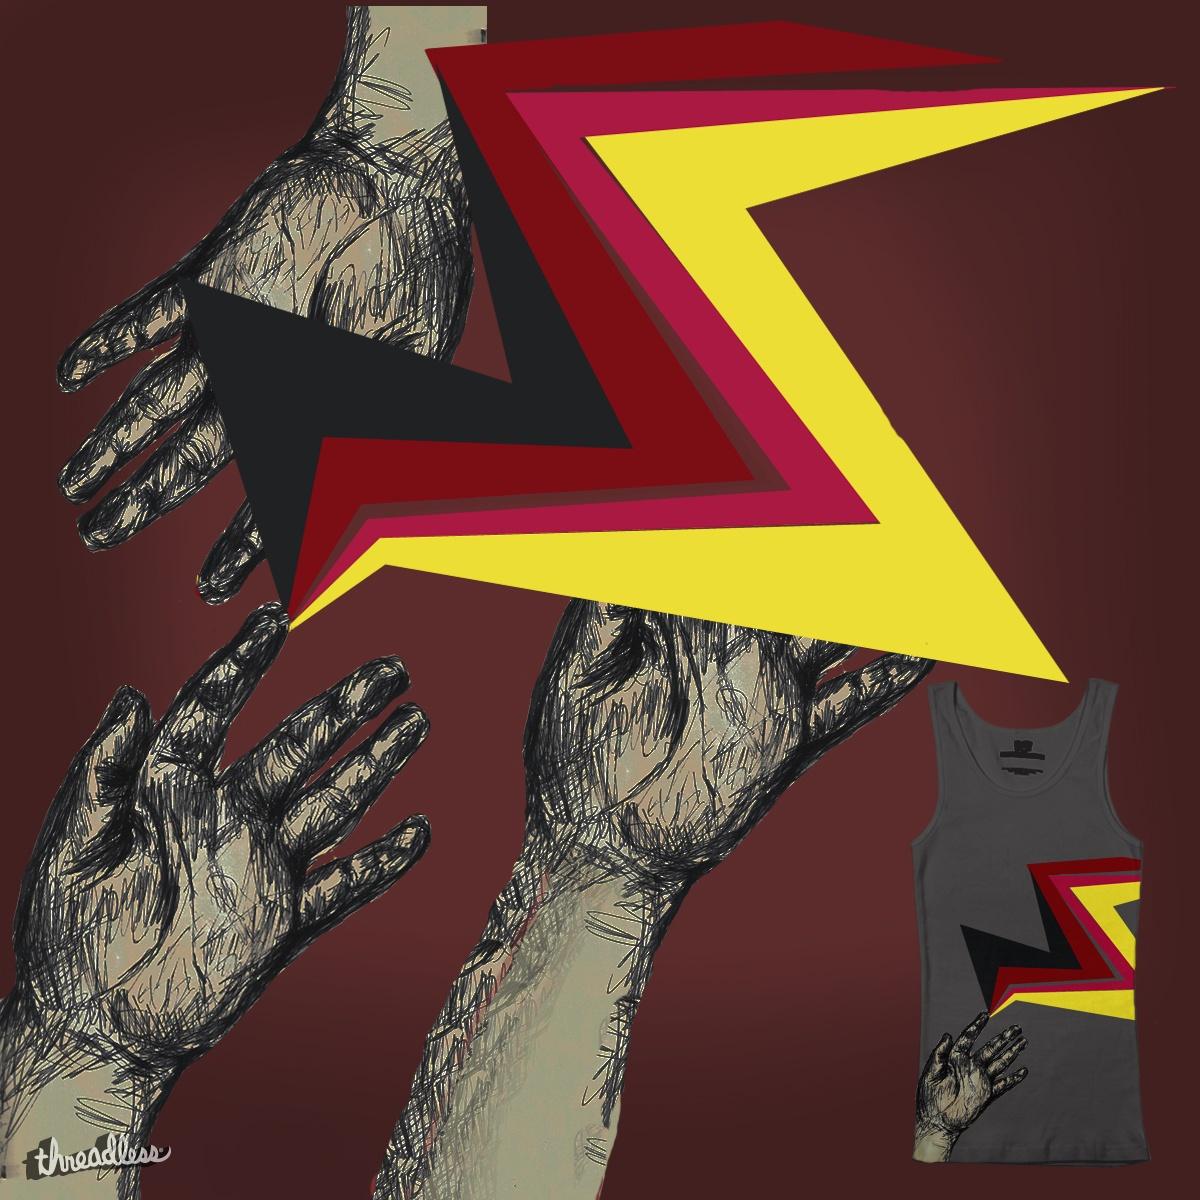 Magic Hand by ltrav on Threadless